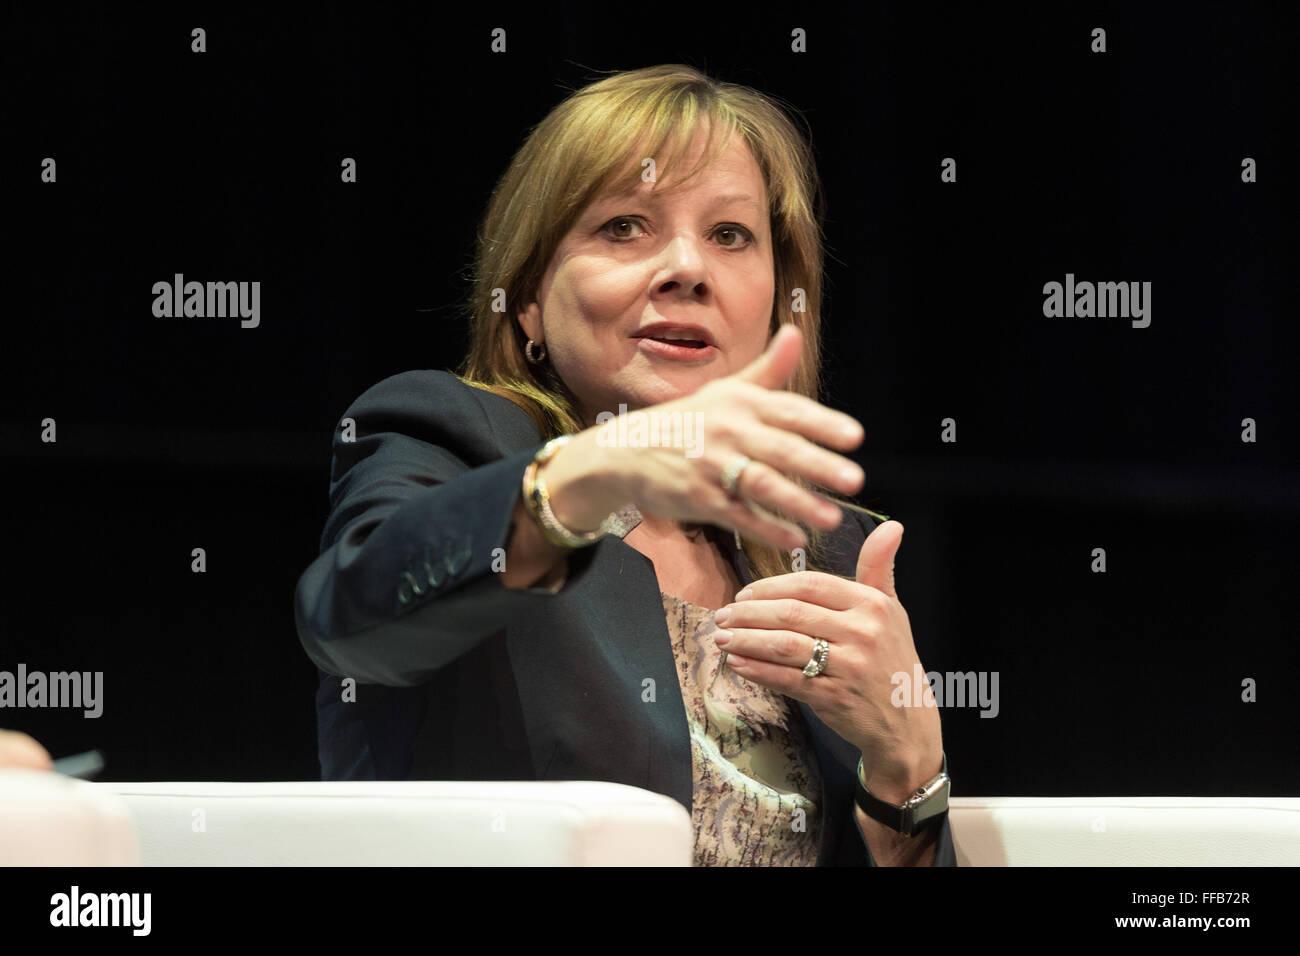 Bochum, Germany. 11th February, 2016. Mary Barra, CEO General Motors, CAR symposium, automotive experts meeting, - Stock Image